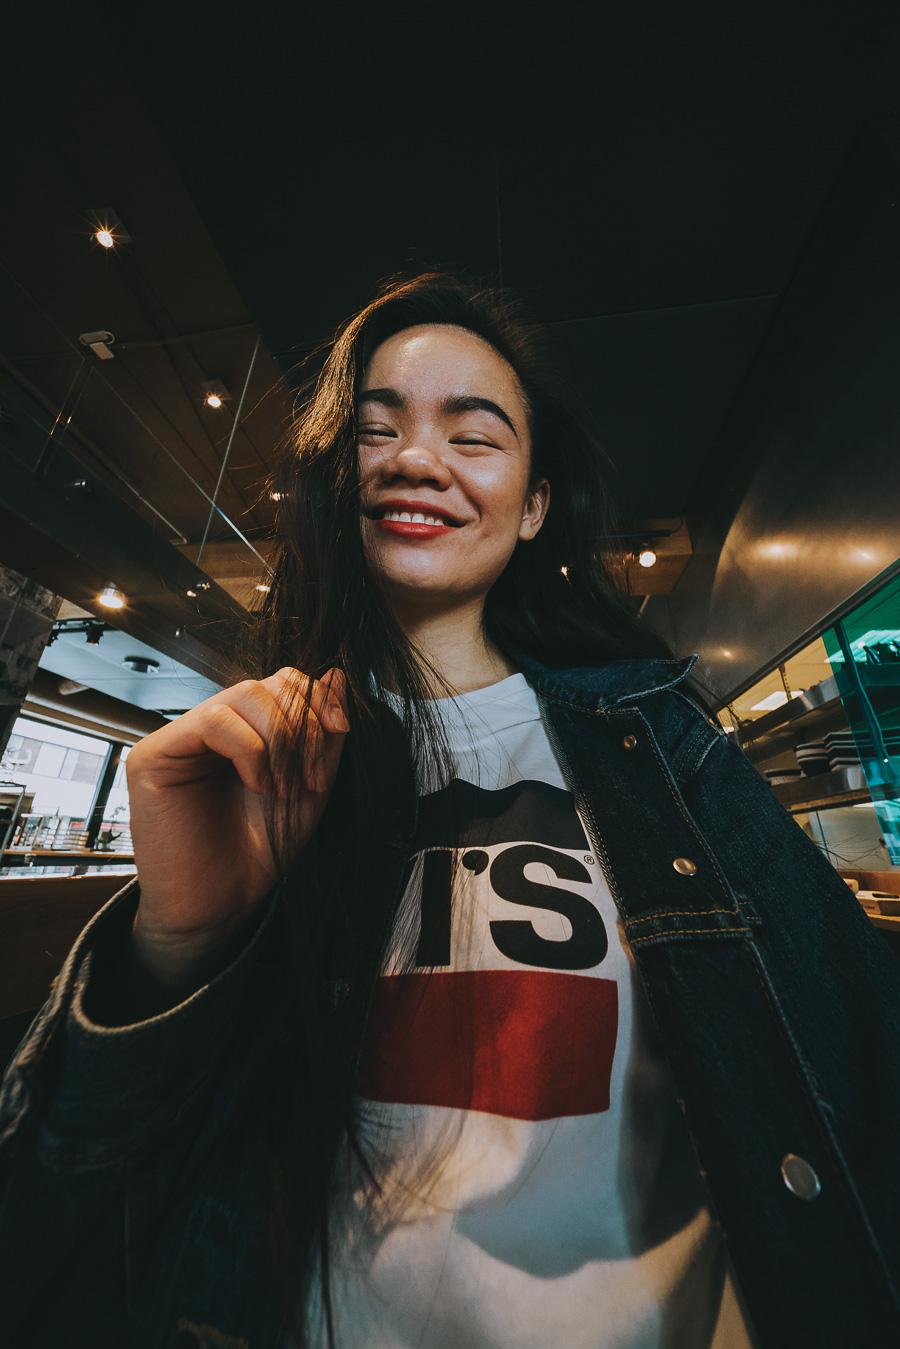 Girl smiling at a restaurant